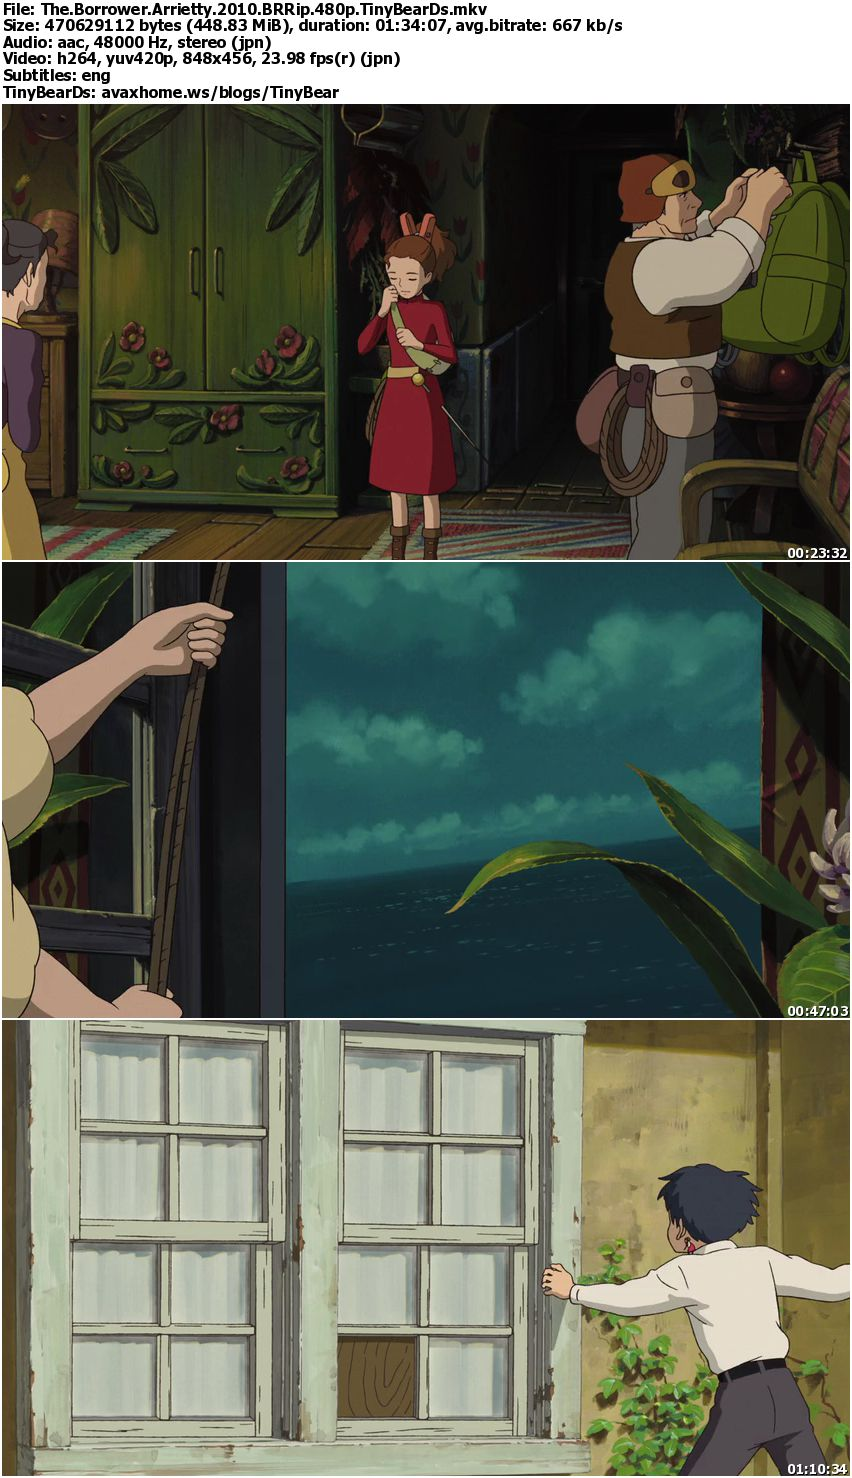 The Borrower Arrietty (2010) [Reuploaded]